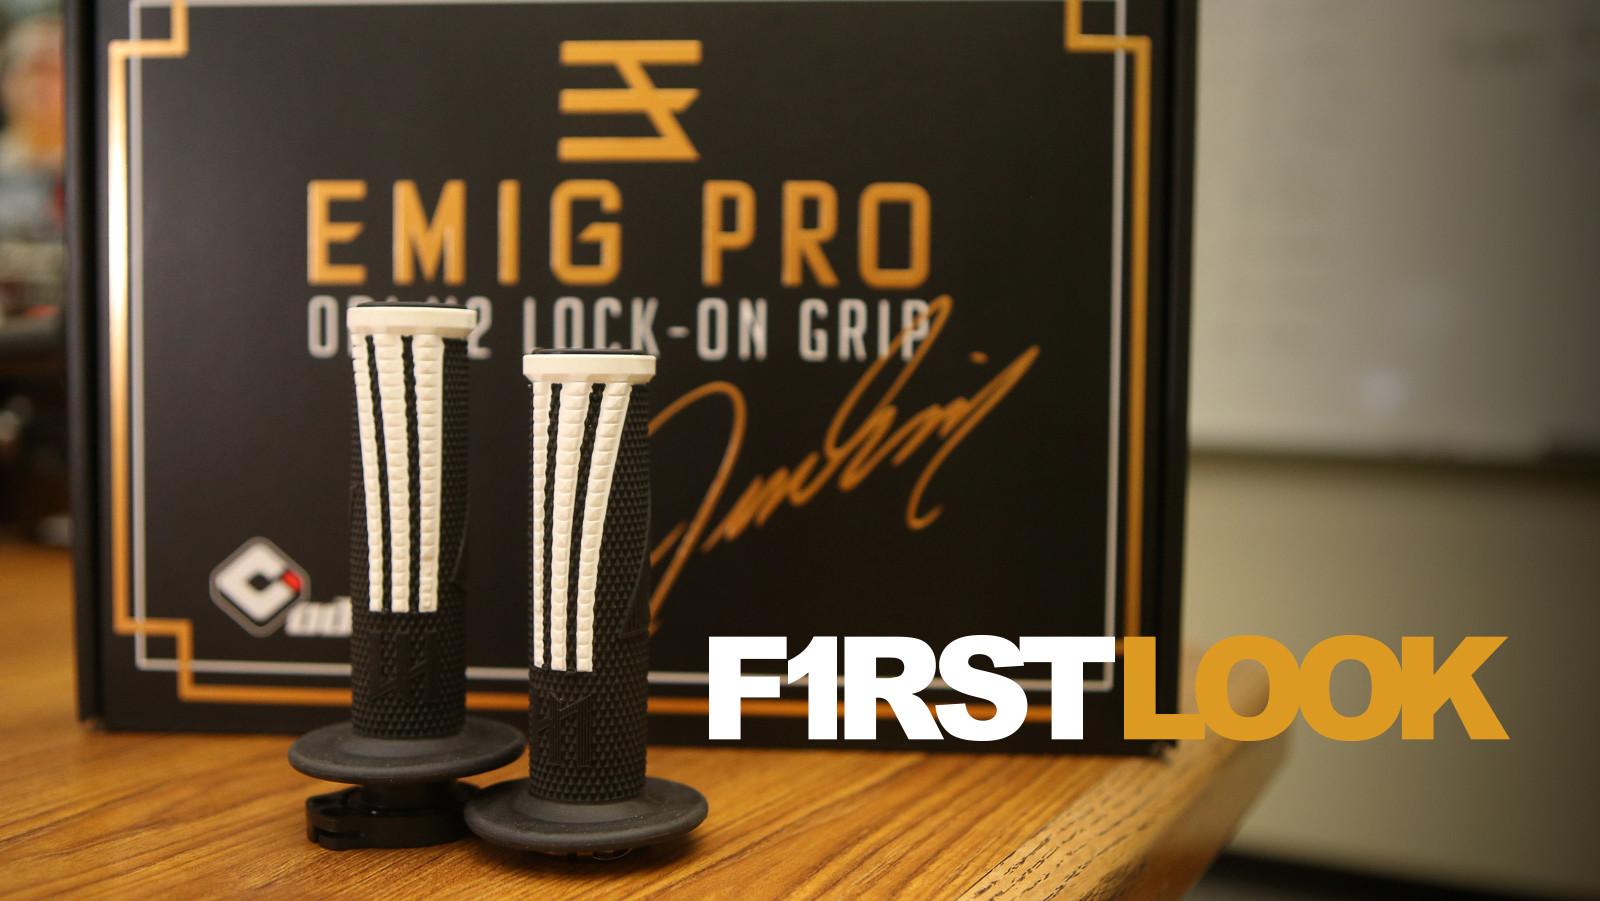 First Look: ODI Emig Pro V2 Lock-On Grip